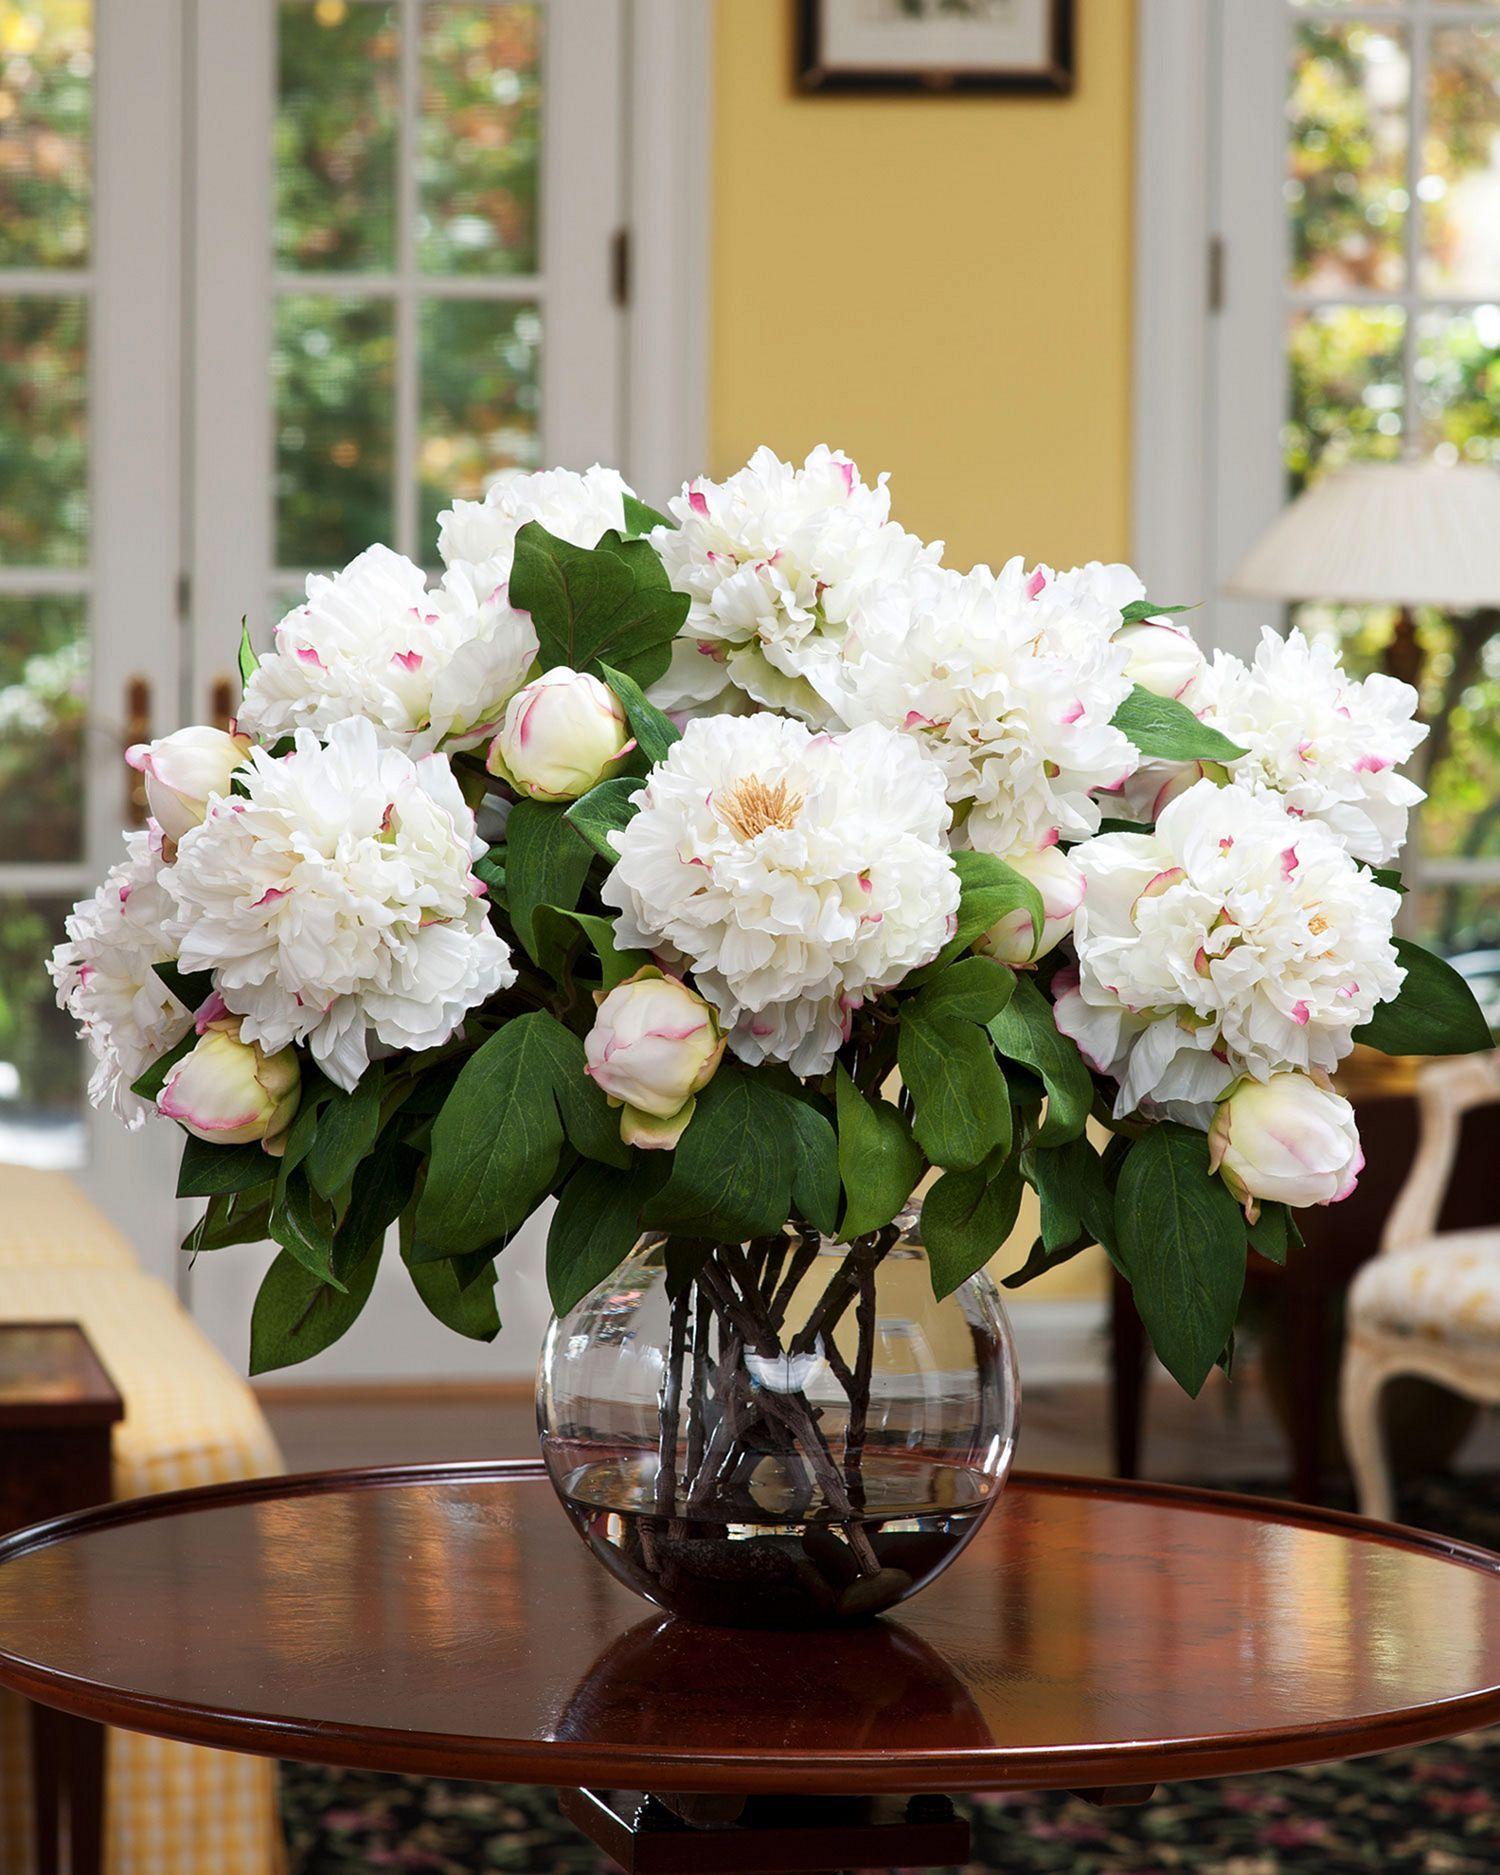 Beautiful Flower Arrangements For Weddings: 55+ Beautiful White Flower Arrangements In Your Wedding